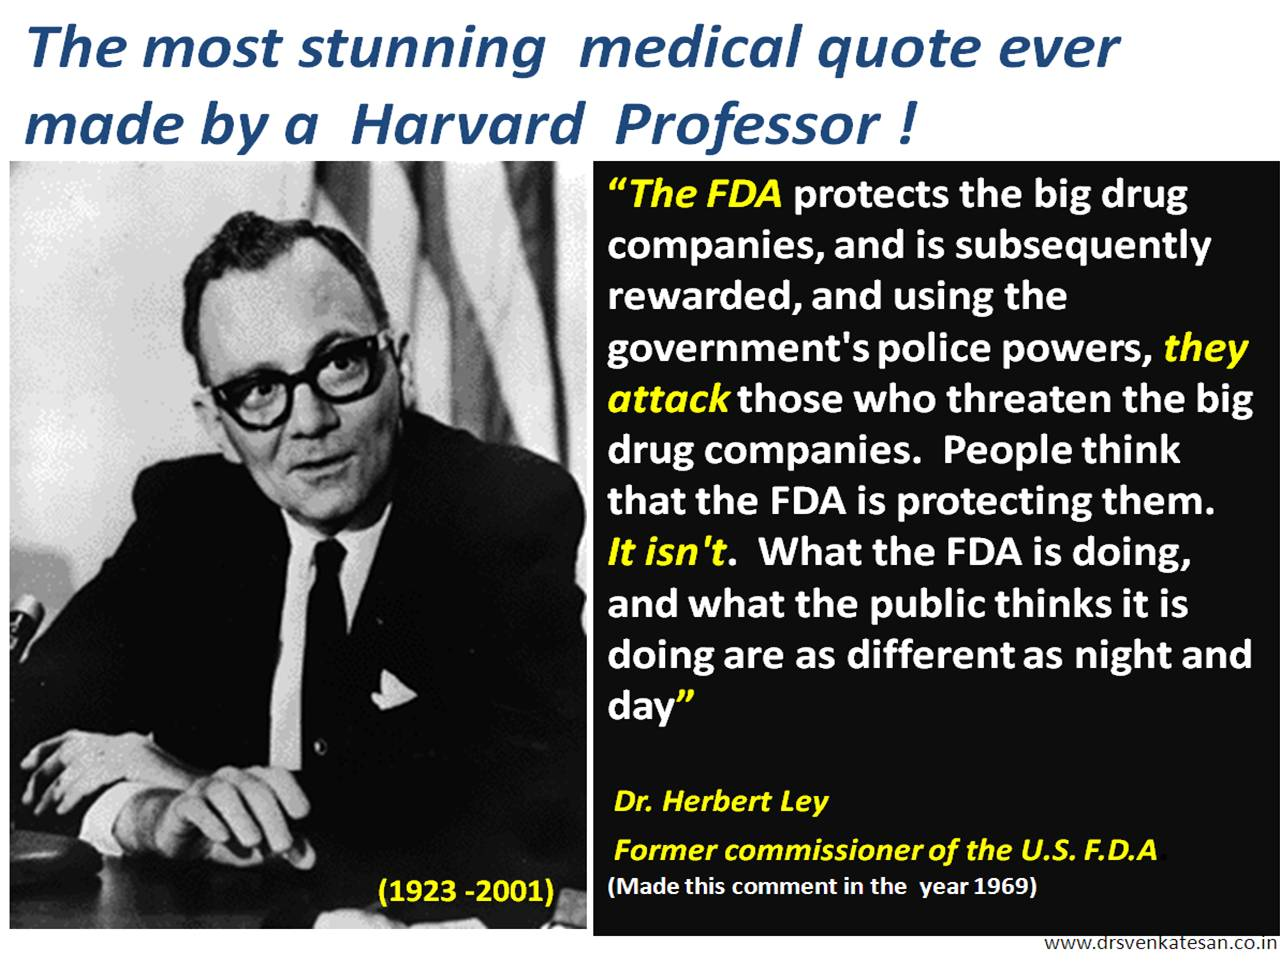 medical quote herbert lay fda modern medicine